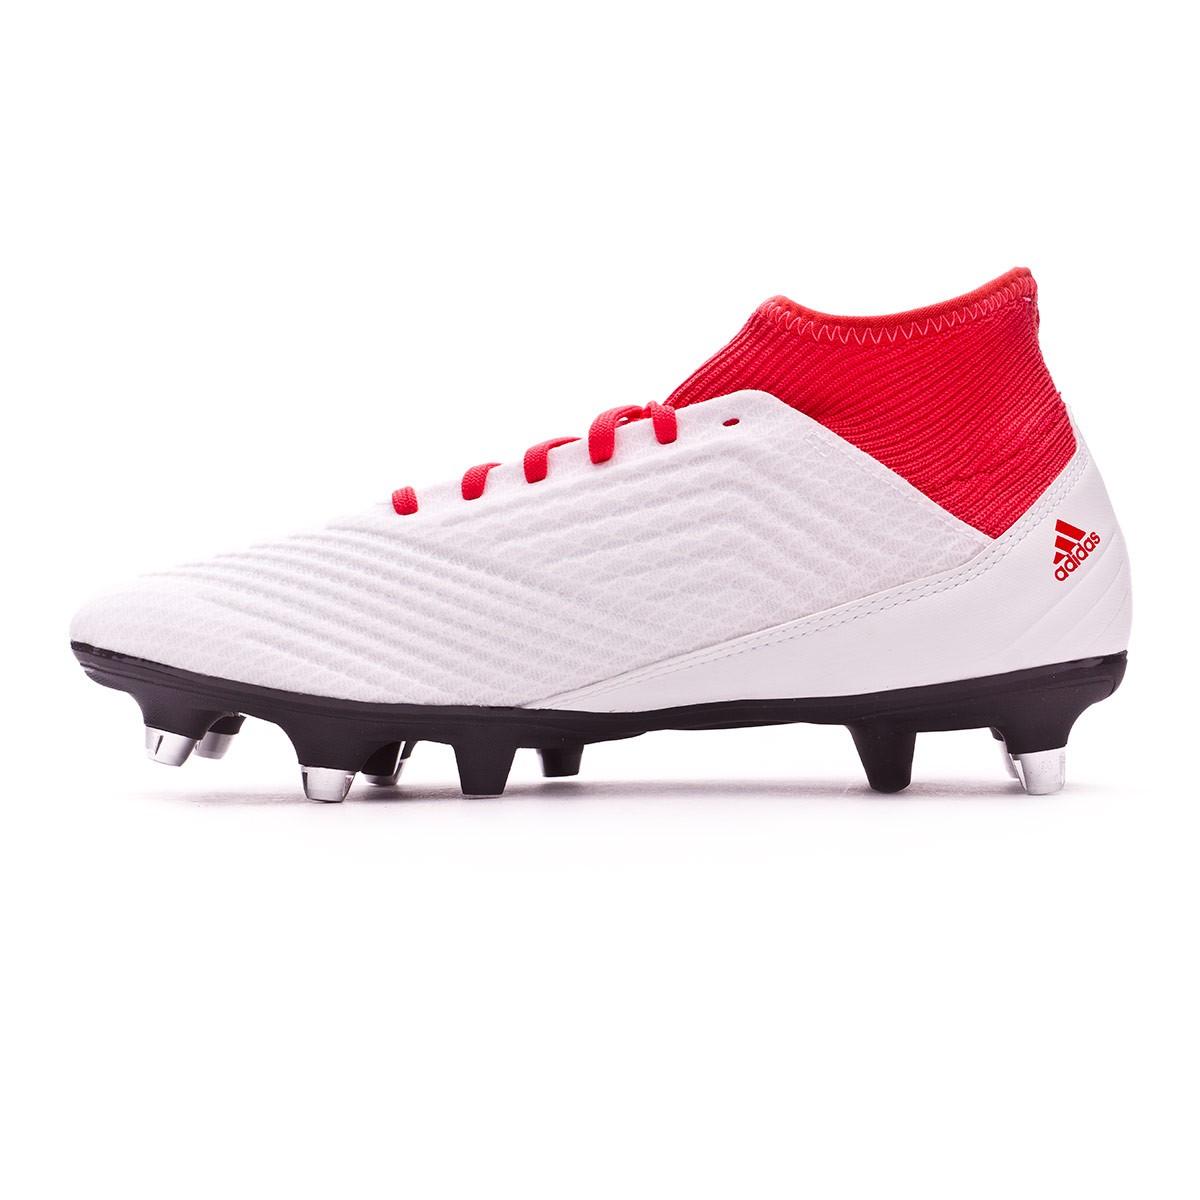 61dff0e9438 Football Boots adidas Predator 18.3 SG White-Core black-Real coral -  Football store Fútbol Emotion